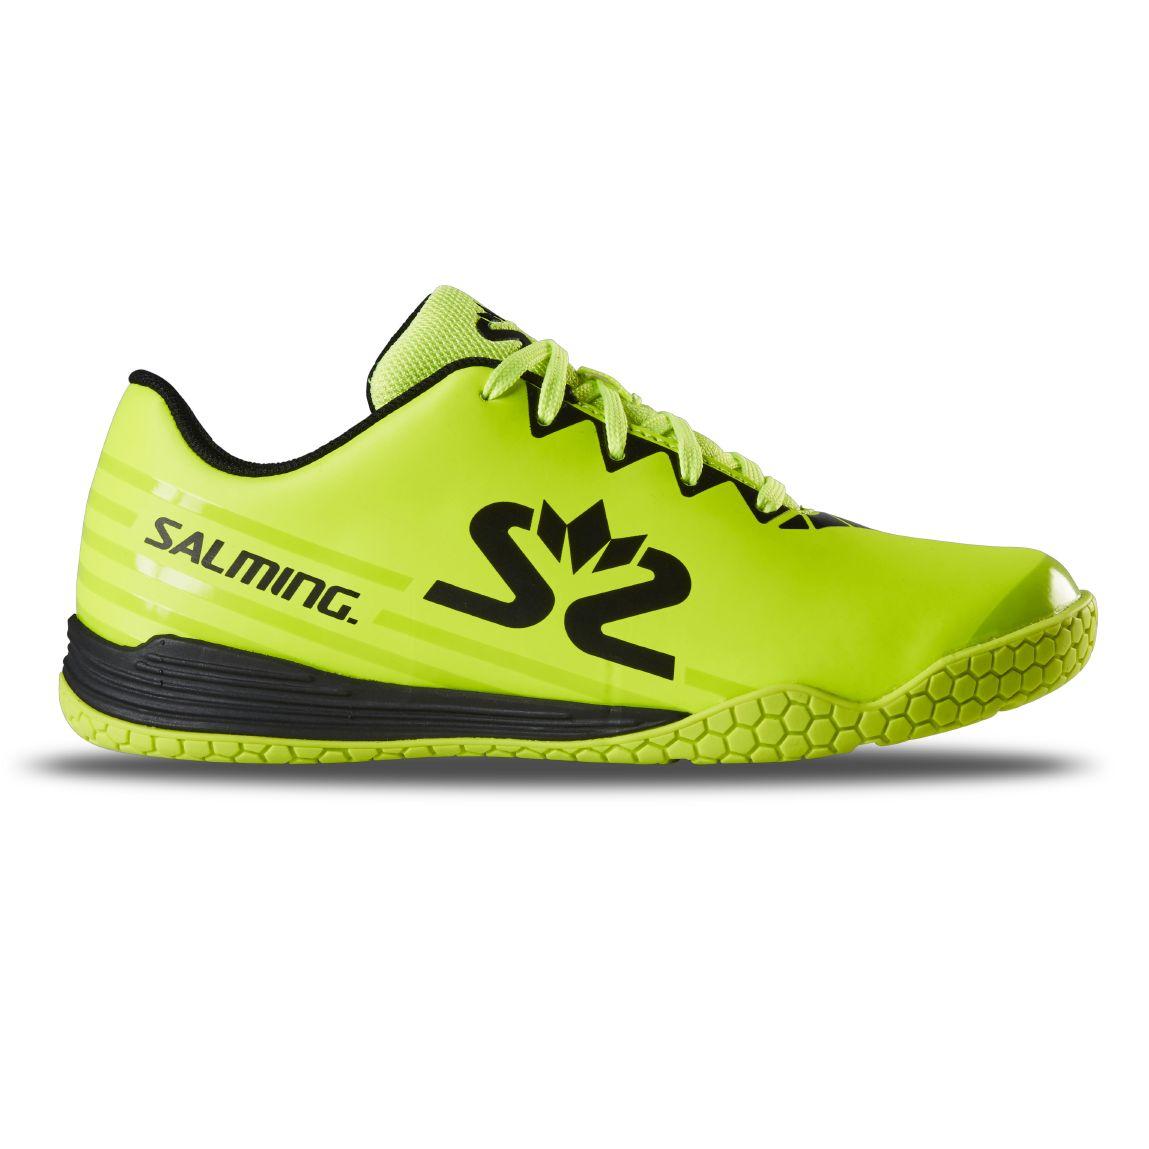 Salming Spark Shoe Kid Fluo Yellow/Black 1 UK - 33 EUR - 21 cm